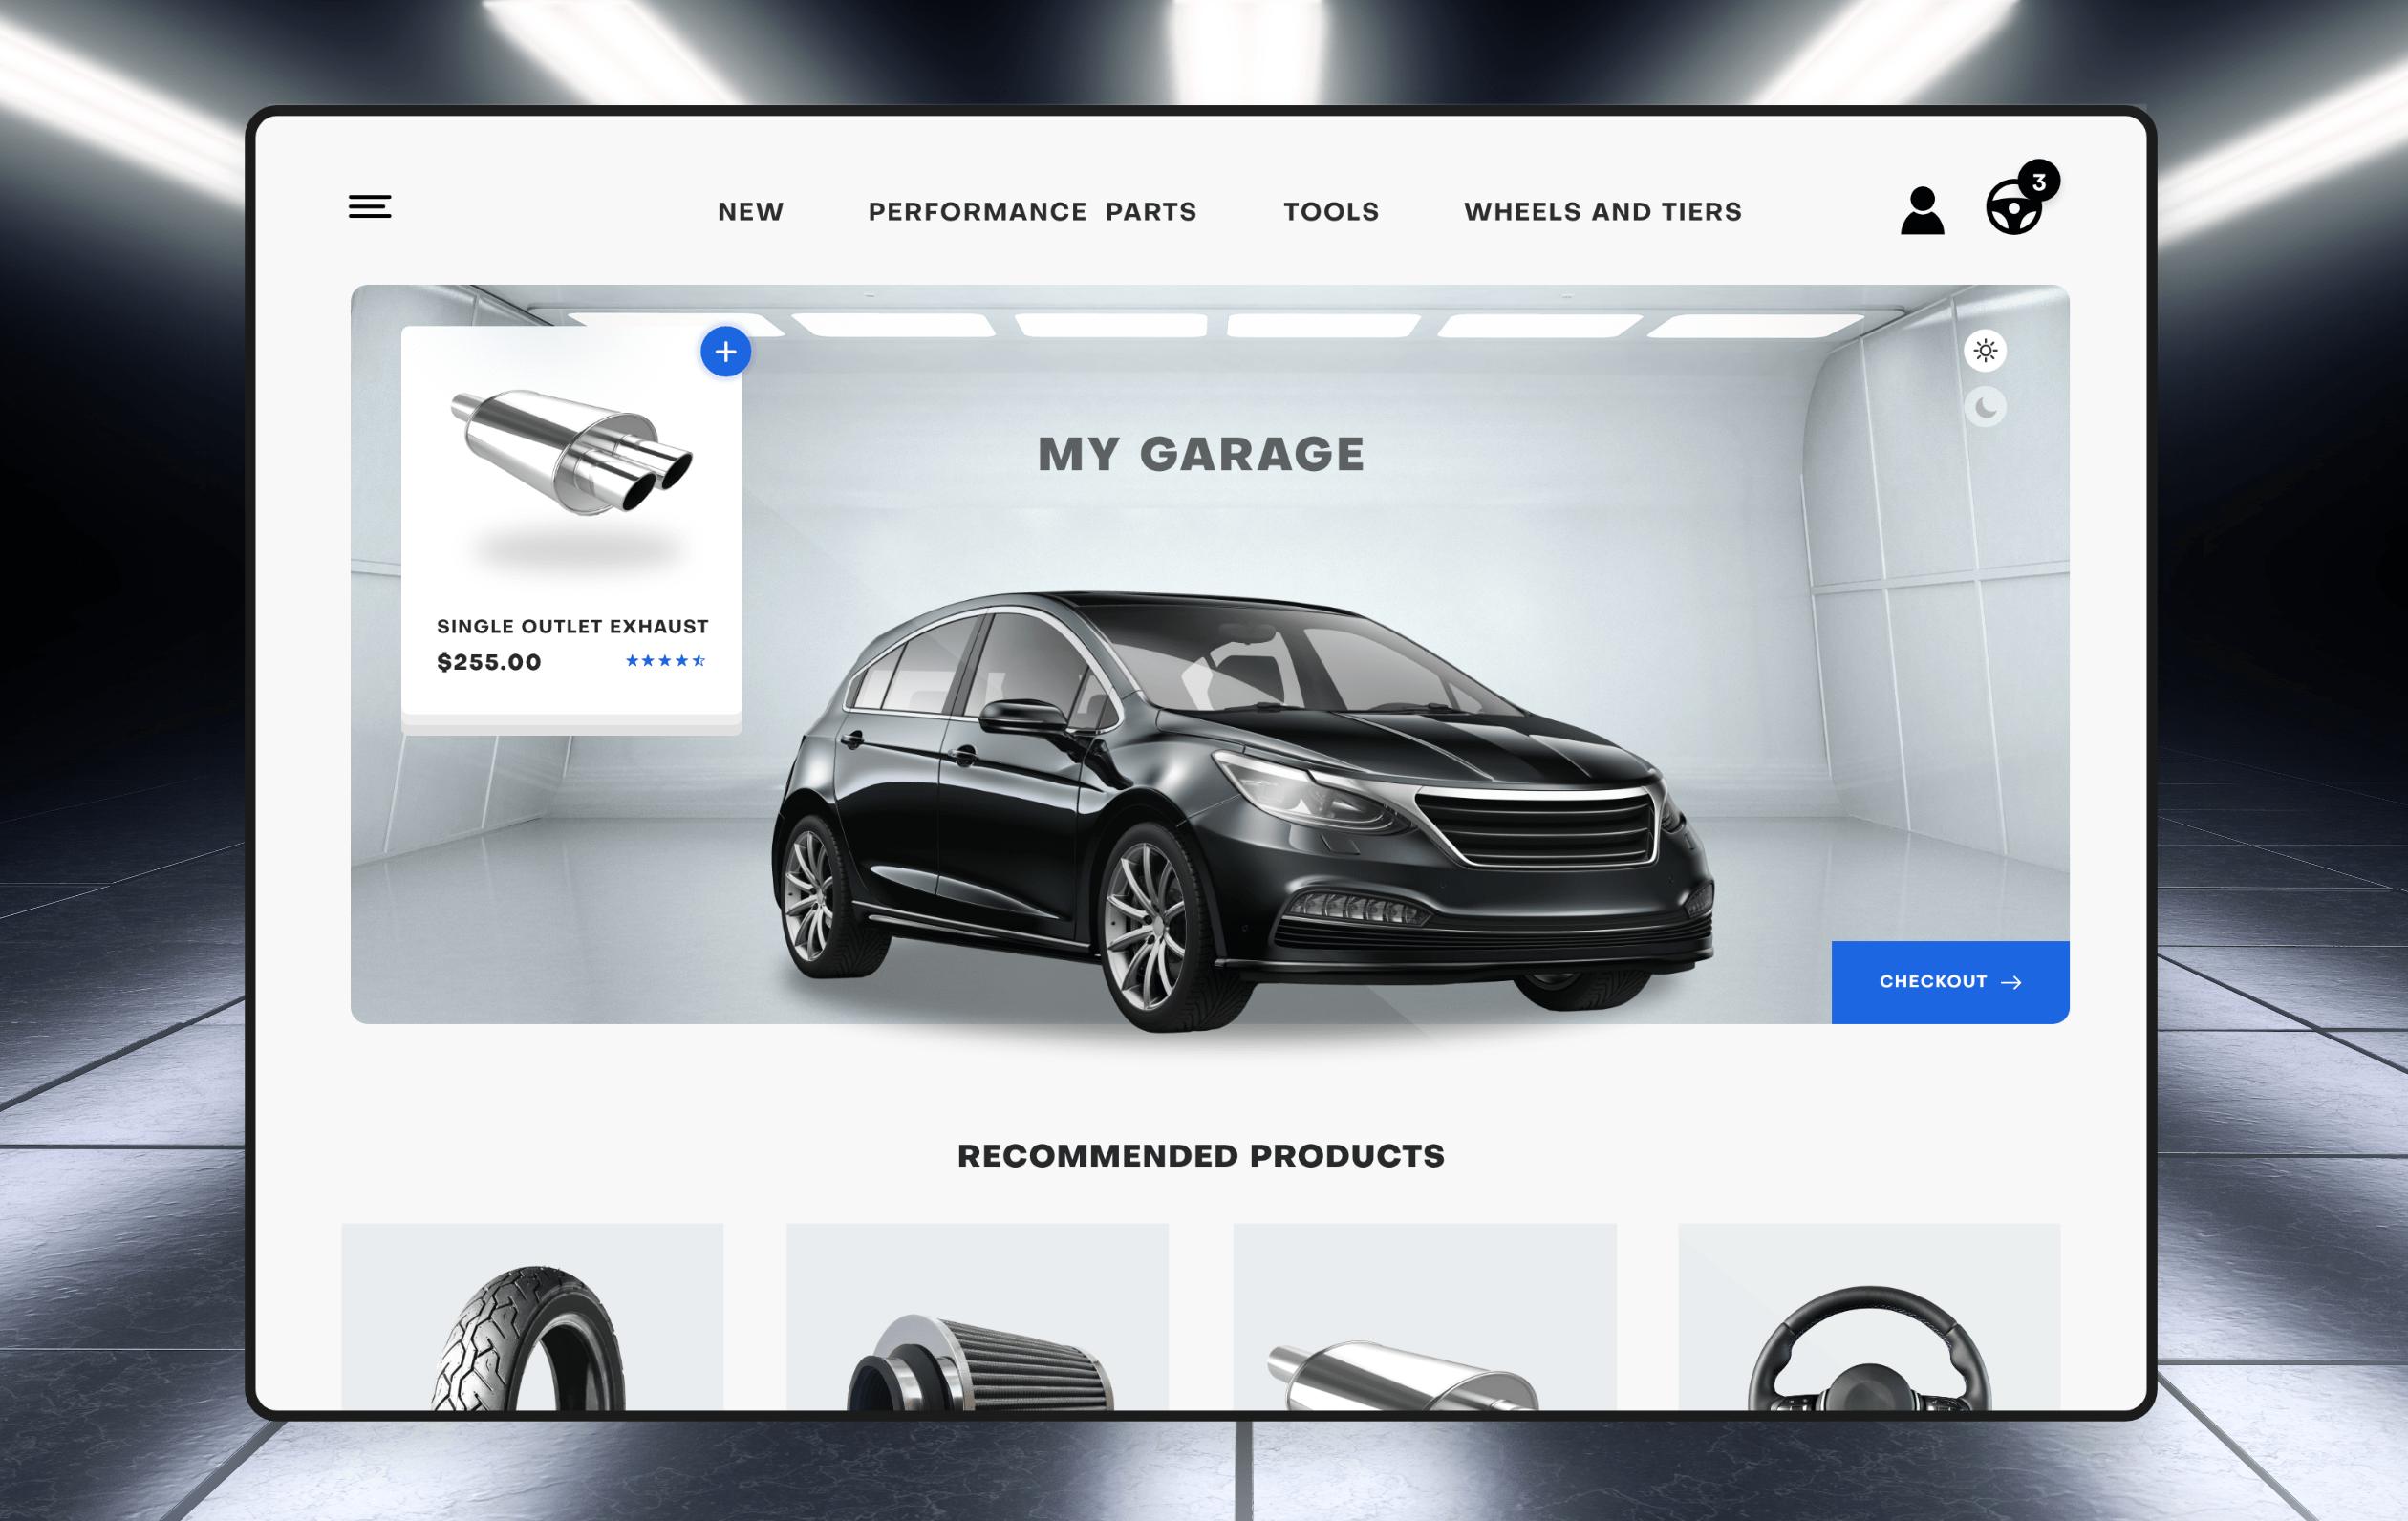 Screenshot of a B2B website that sells automotive parts